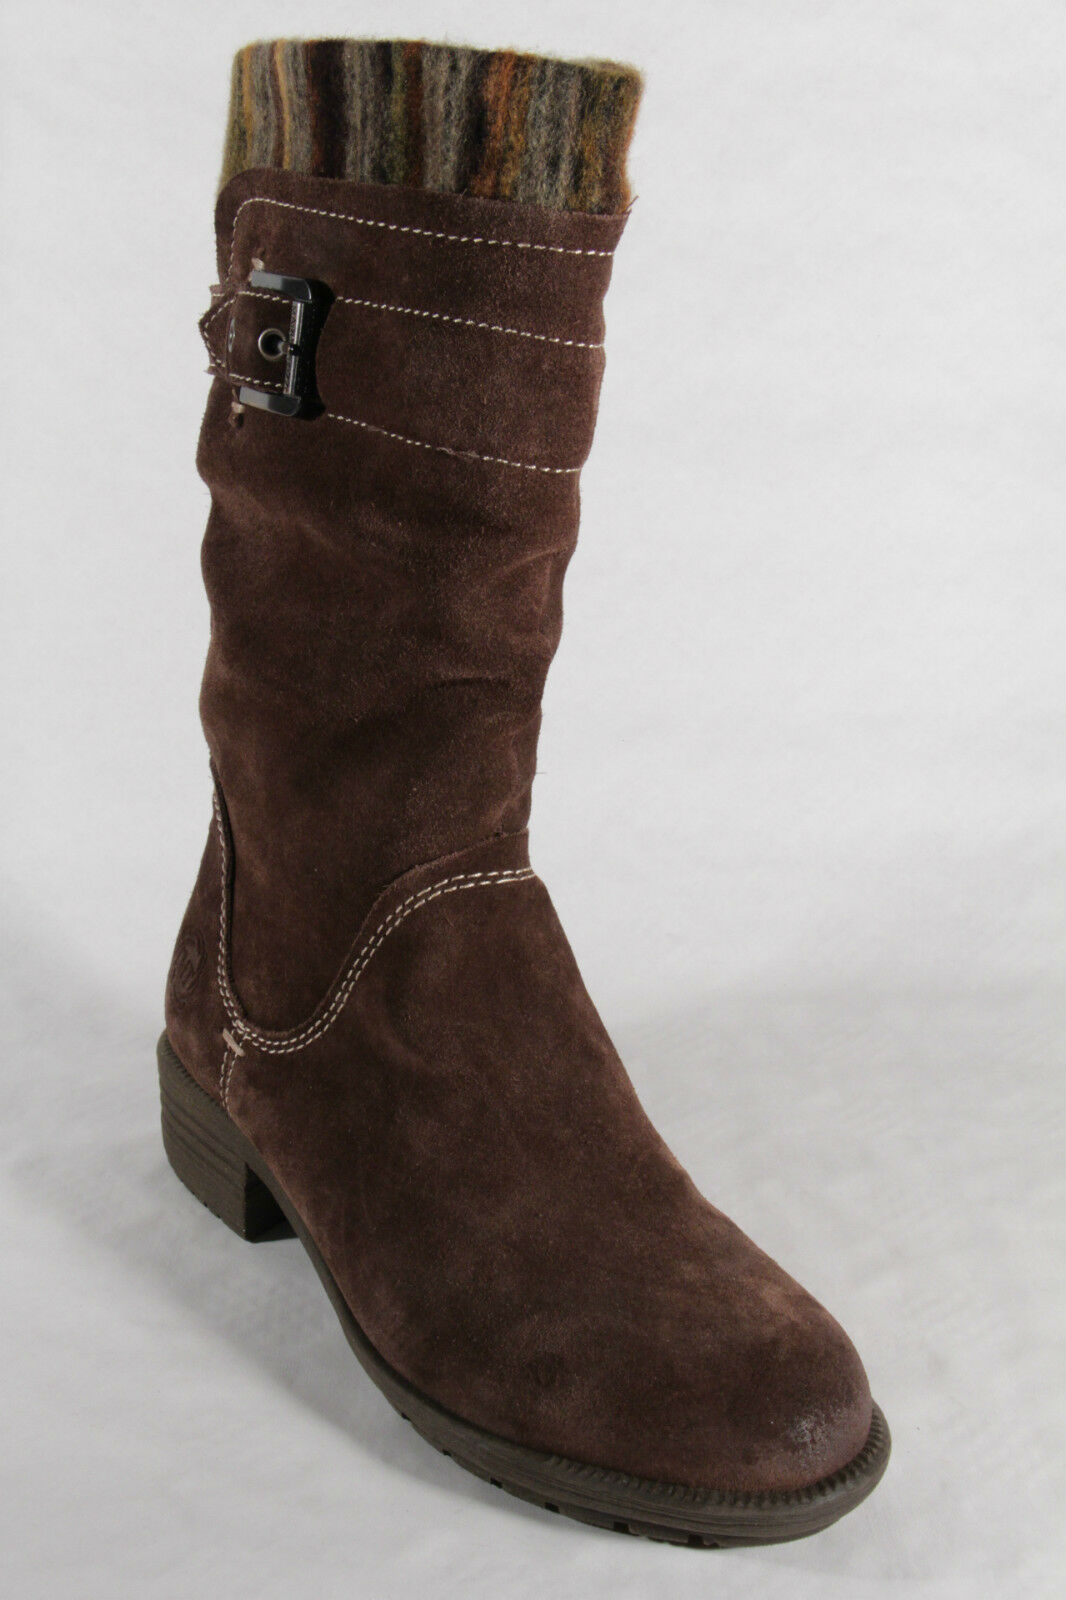 bf4b3e117d7b 4 Marco Tozzi Damen Stiefel Stiefeletten Winterstiefel Boots SP 39, 00 €  NEU!! 5